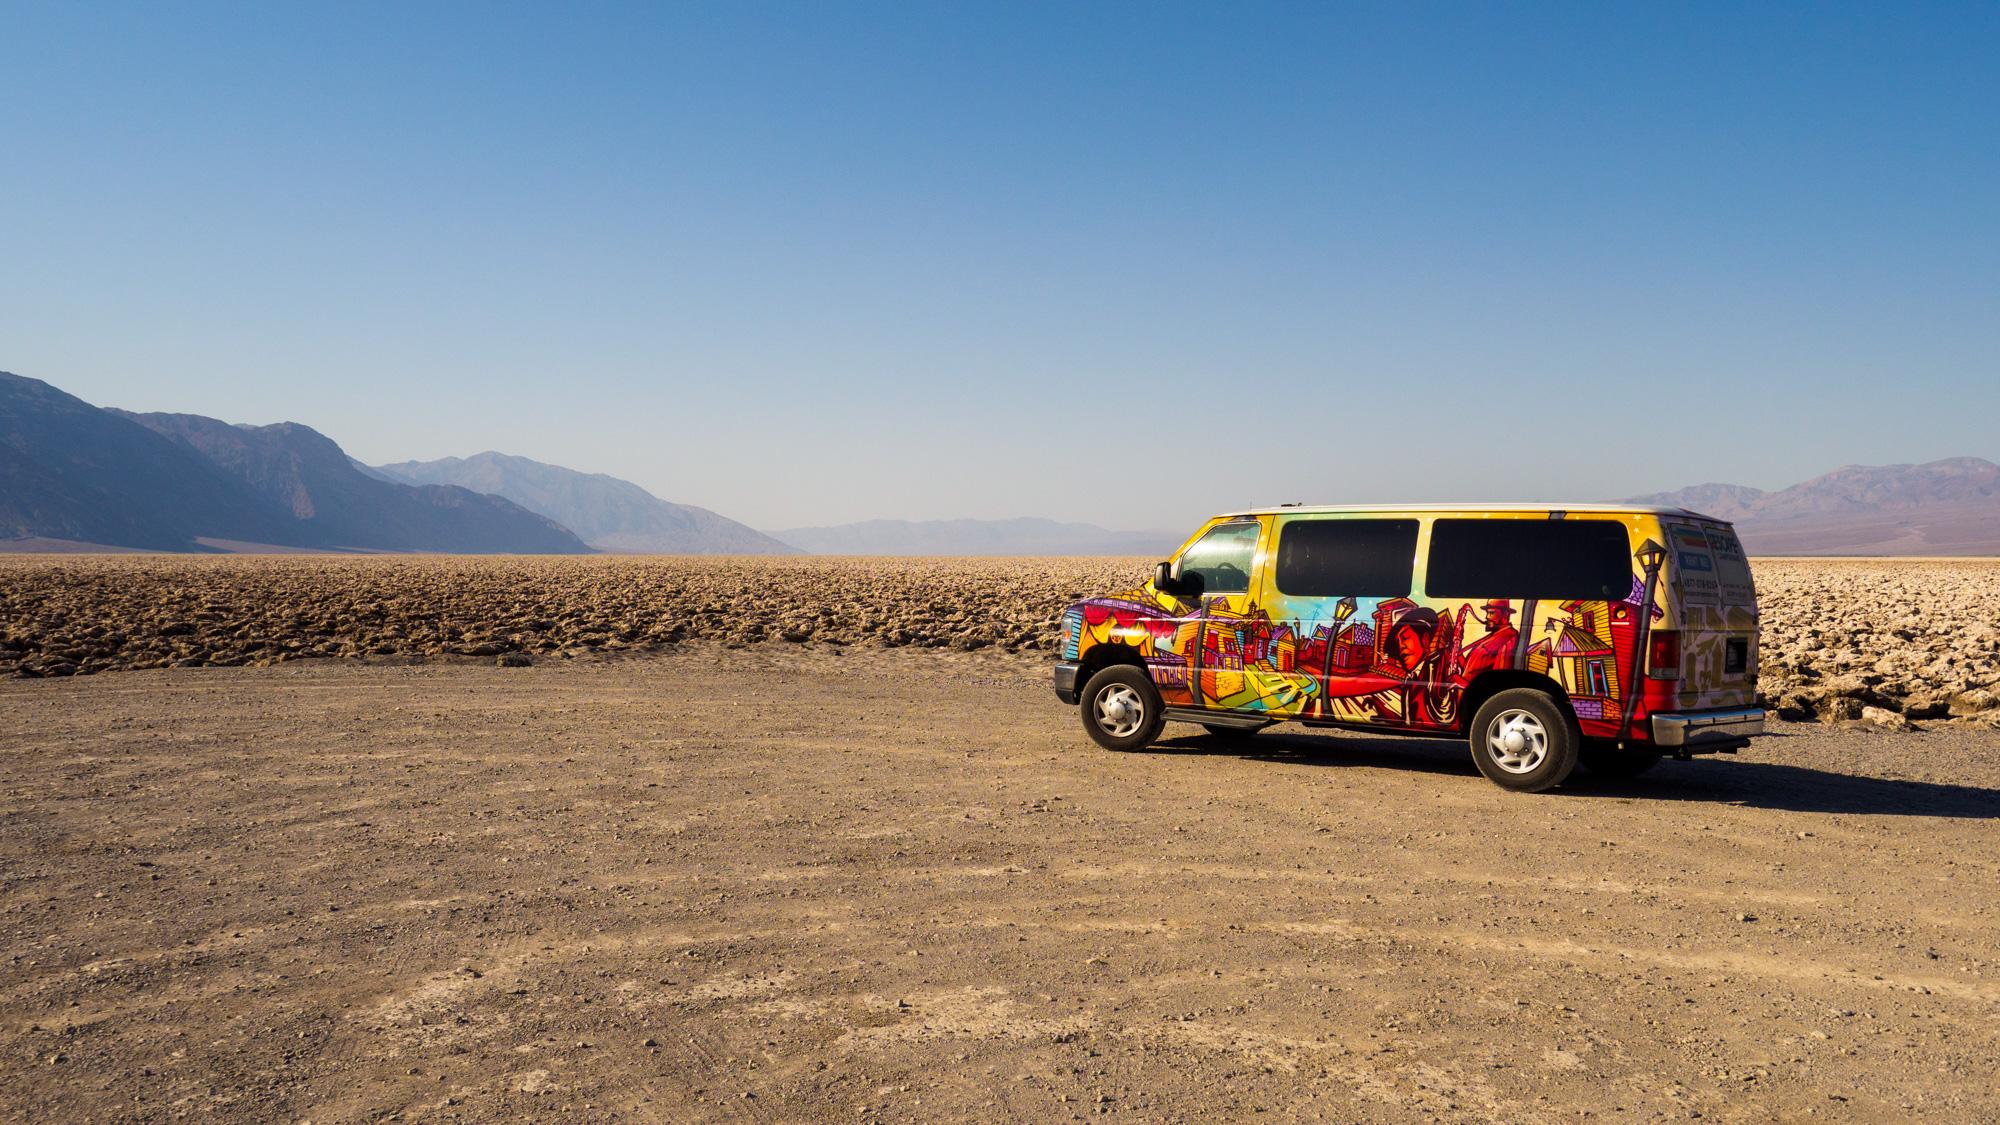 Death Valley Nationalpark - Devils Golfcourse